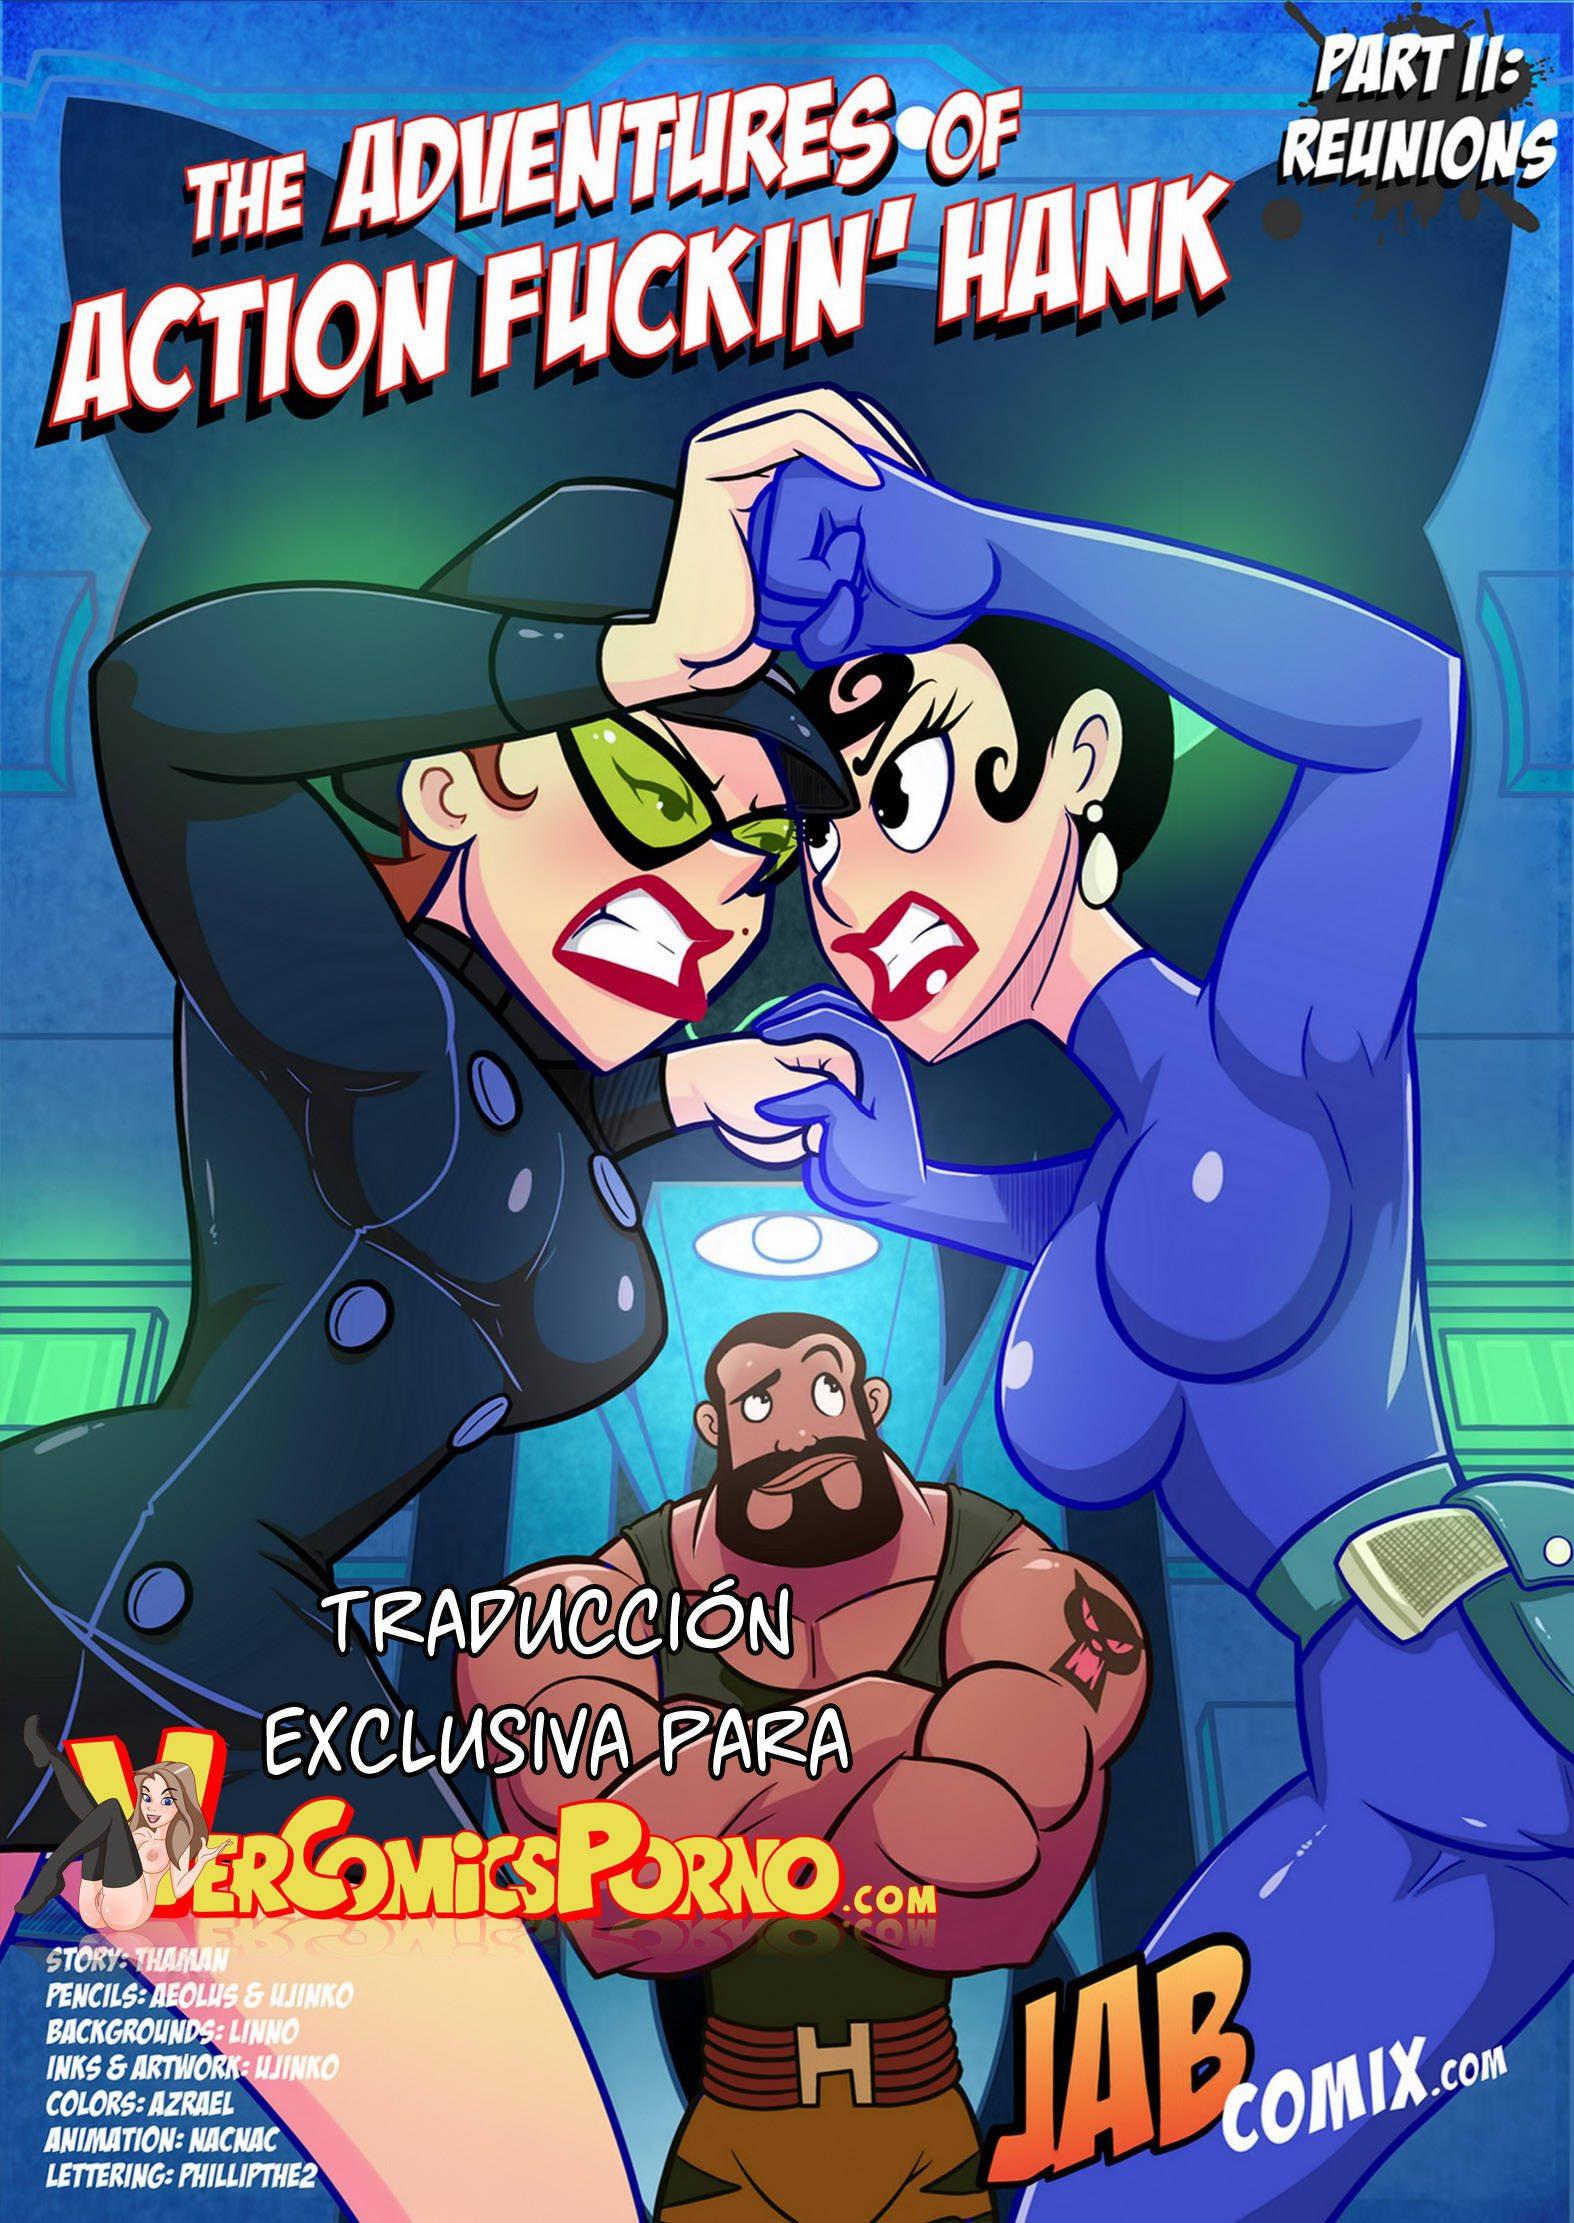 adventures-of-action-fuckin-hank-2-completo 1